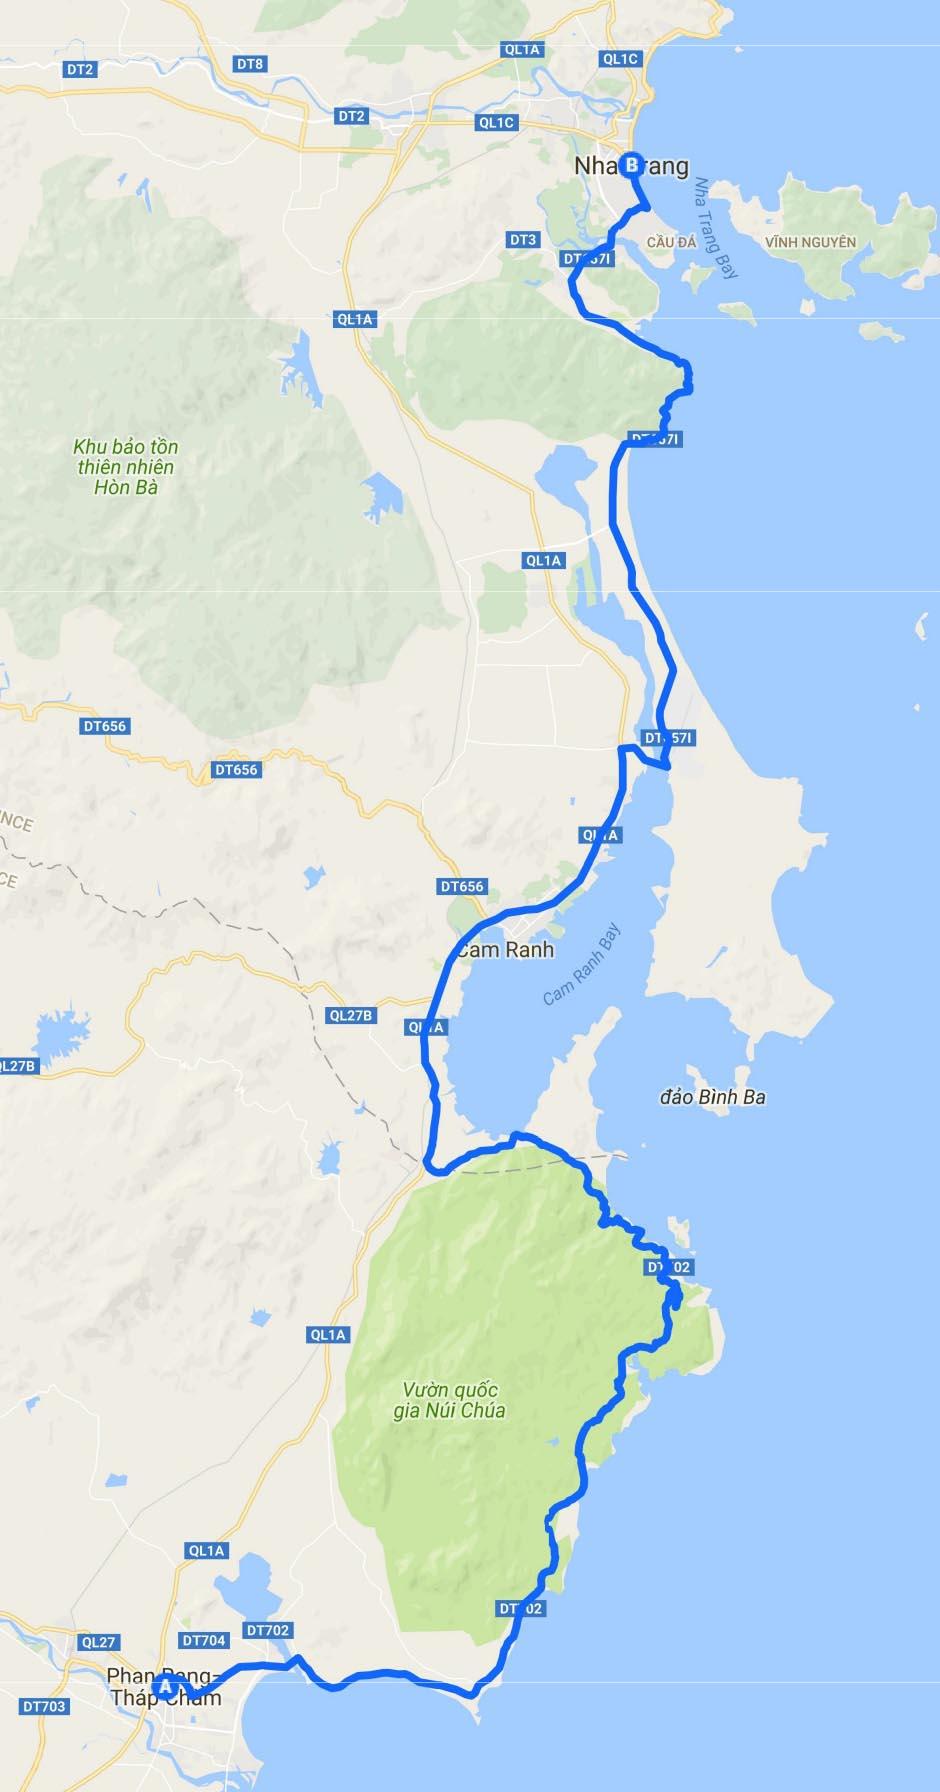 Vietnam routes and maps by motorbike TigitMotorbikes